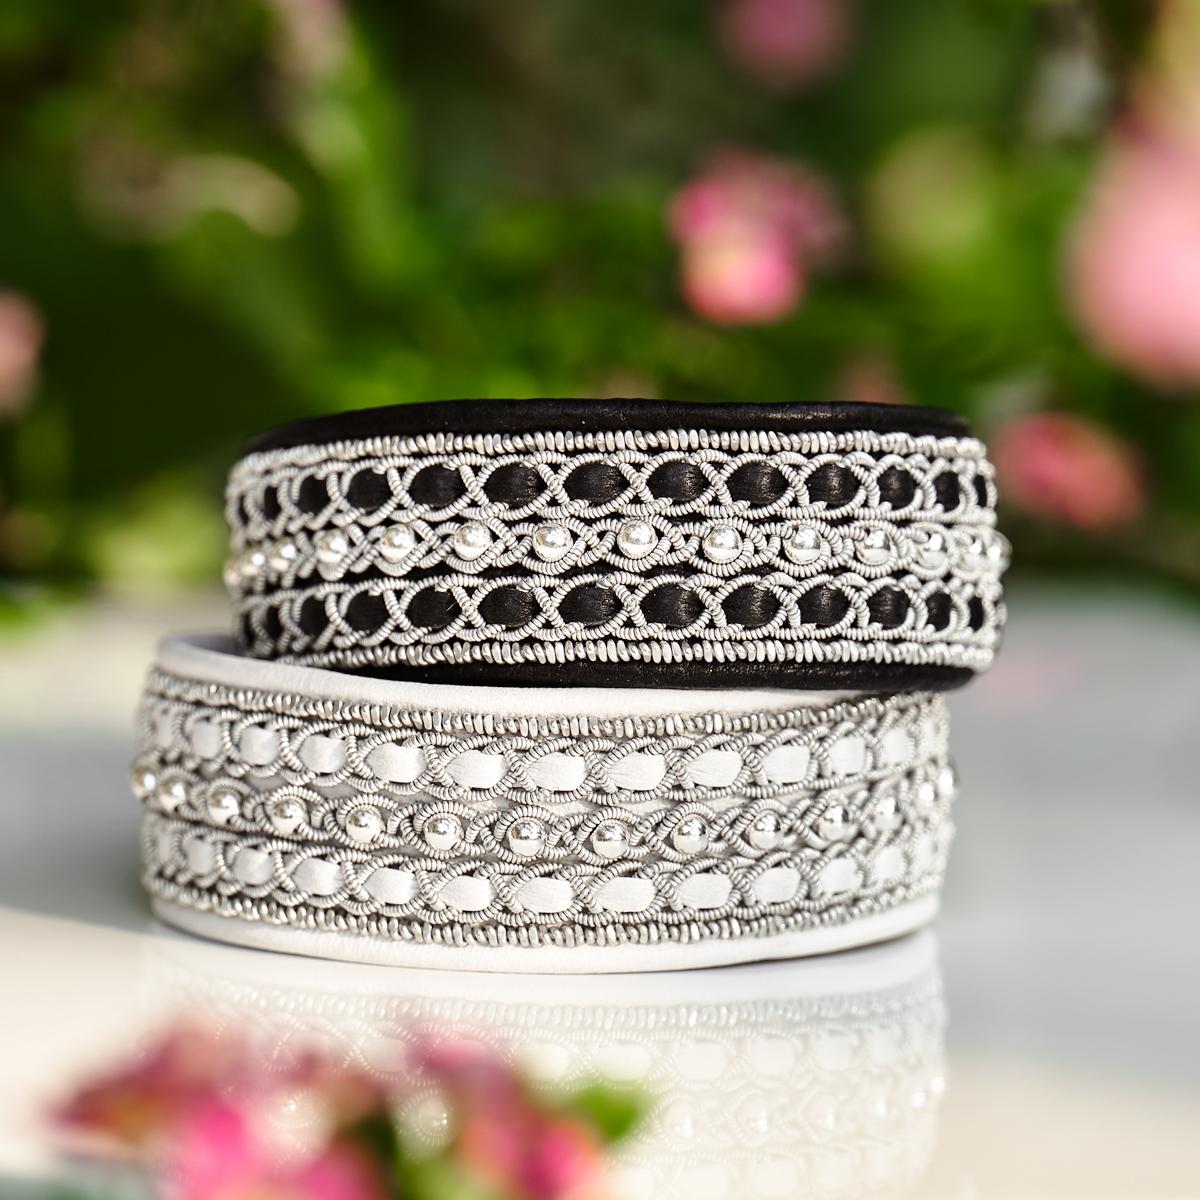 Tennarmband ask Nordic Jewelry design